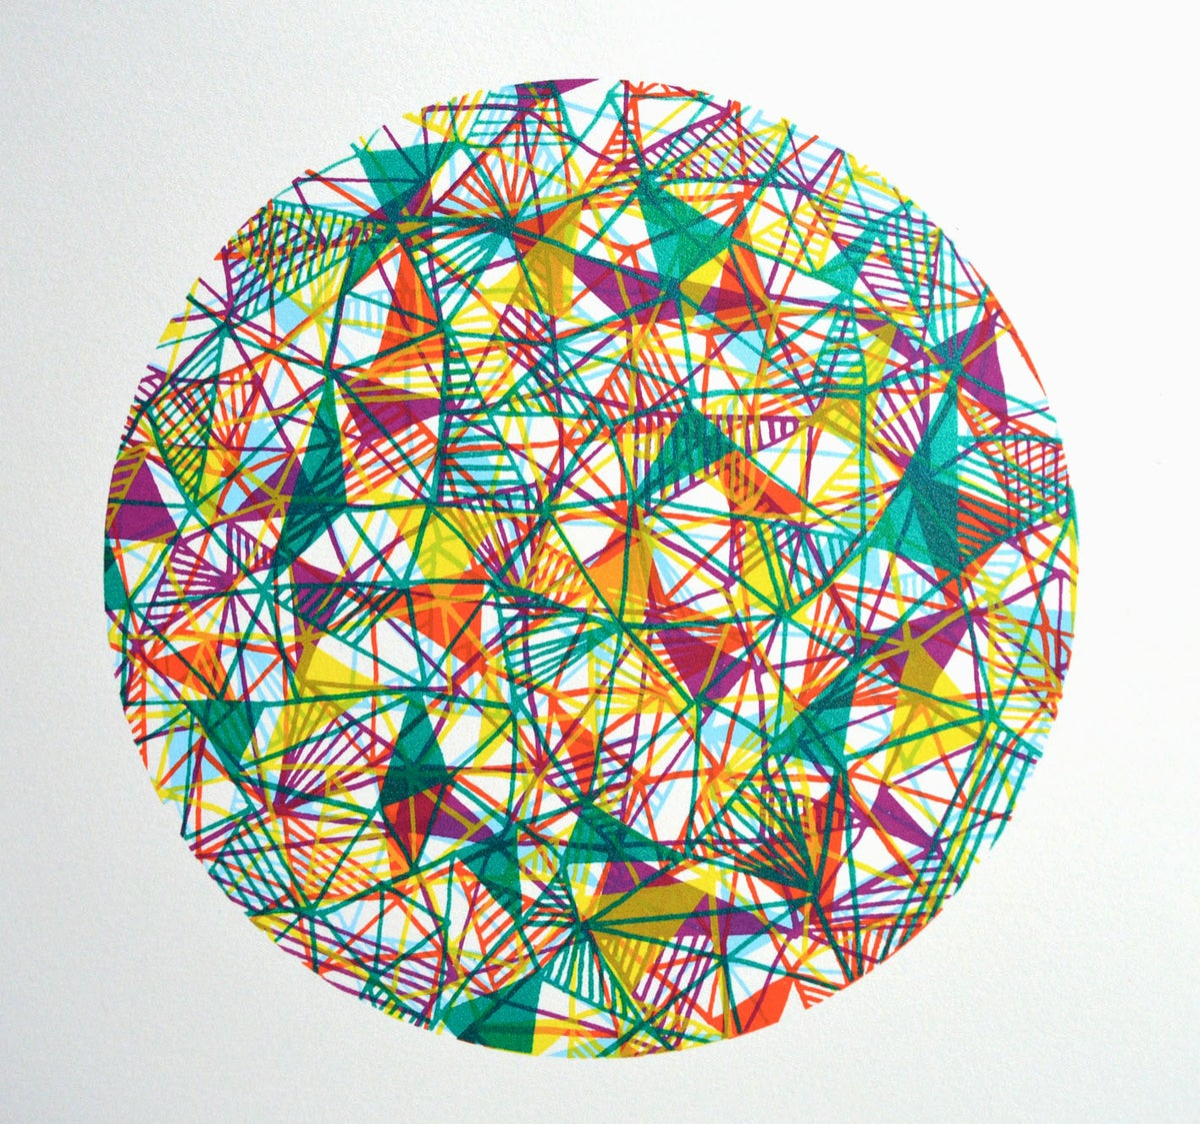 Image of 'Framework in Green'